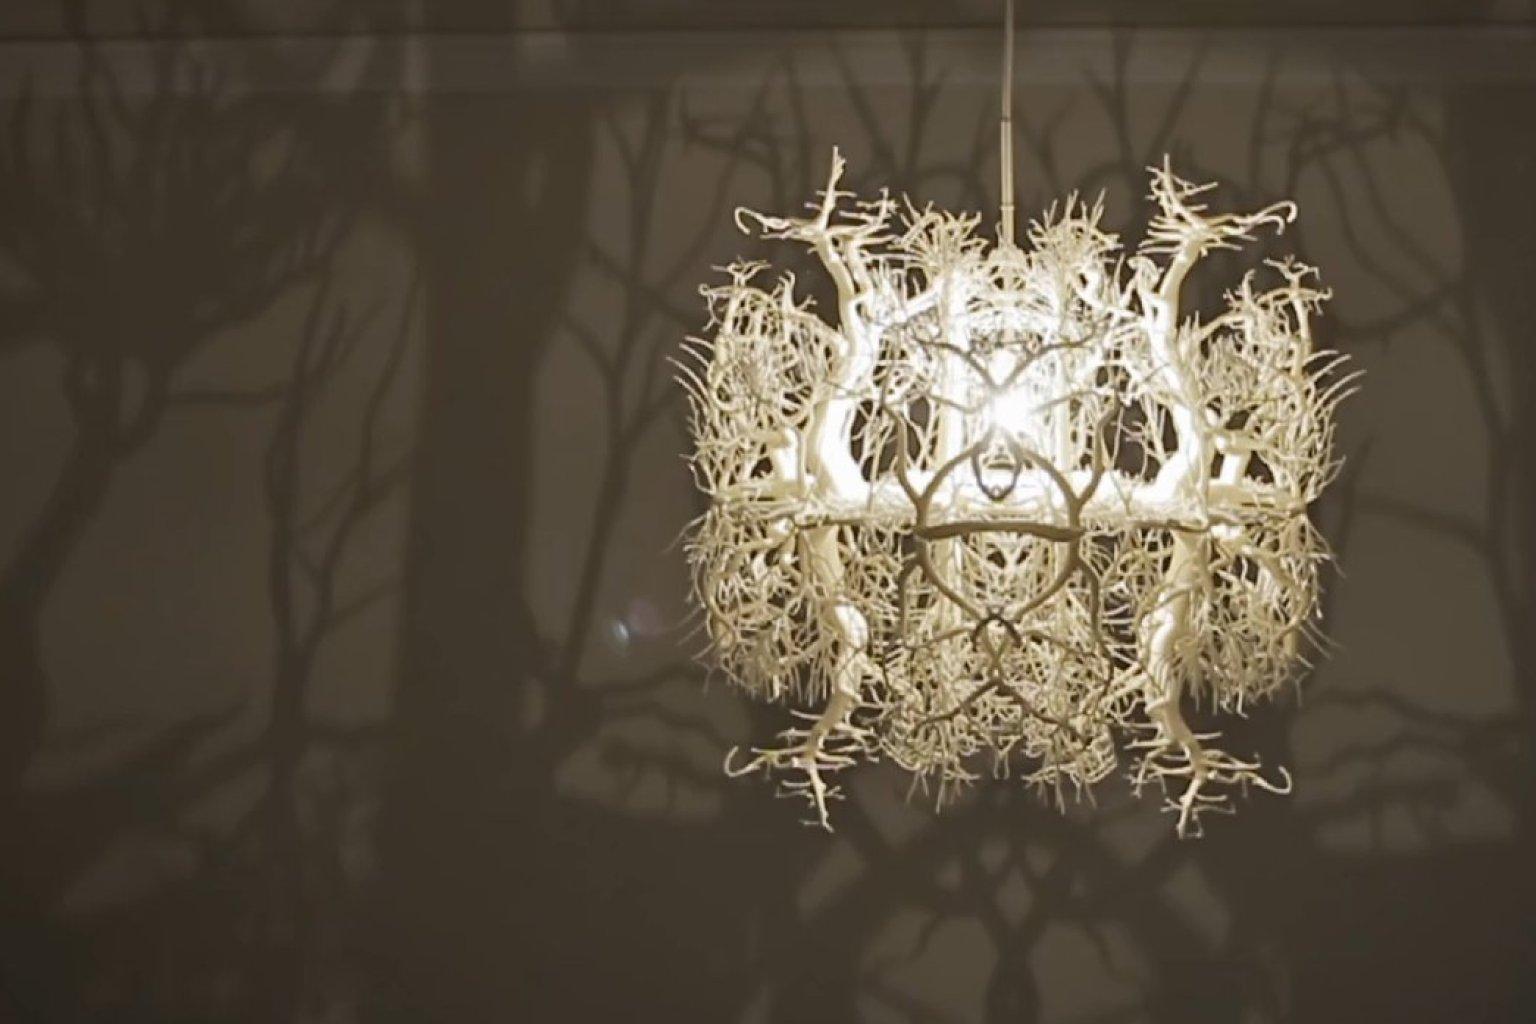 Thyra hilden and pio diaz artists created the coolest chandelier thyra hilden and pio diaz artists created the coolest chandelier ever video huffpost aloadofball Gallery